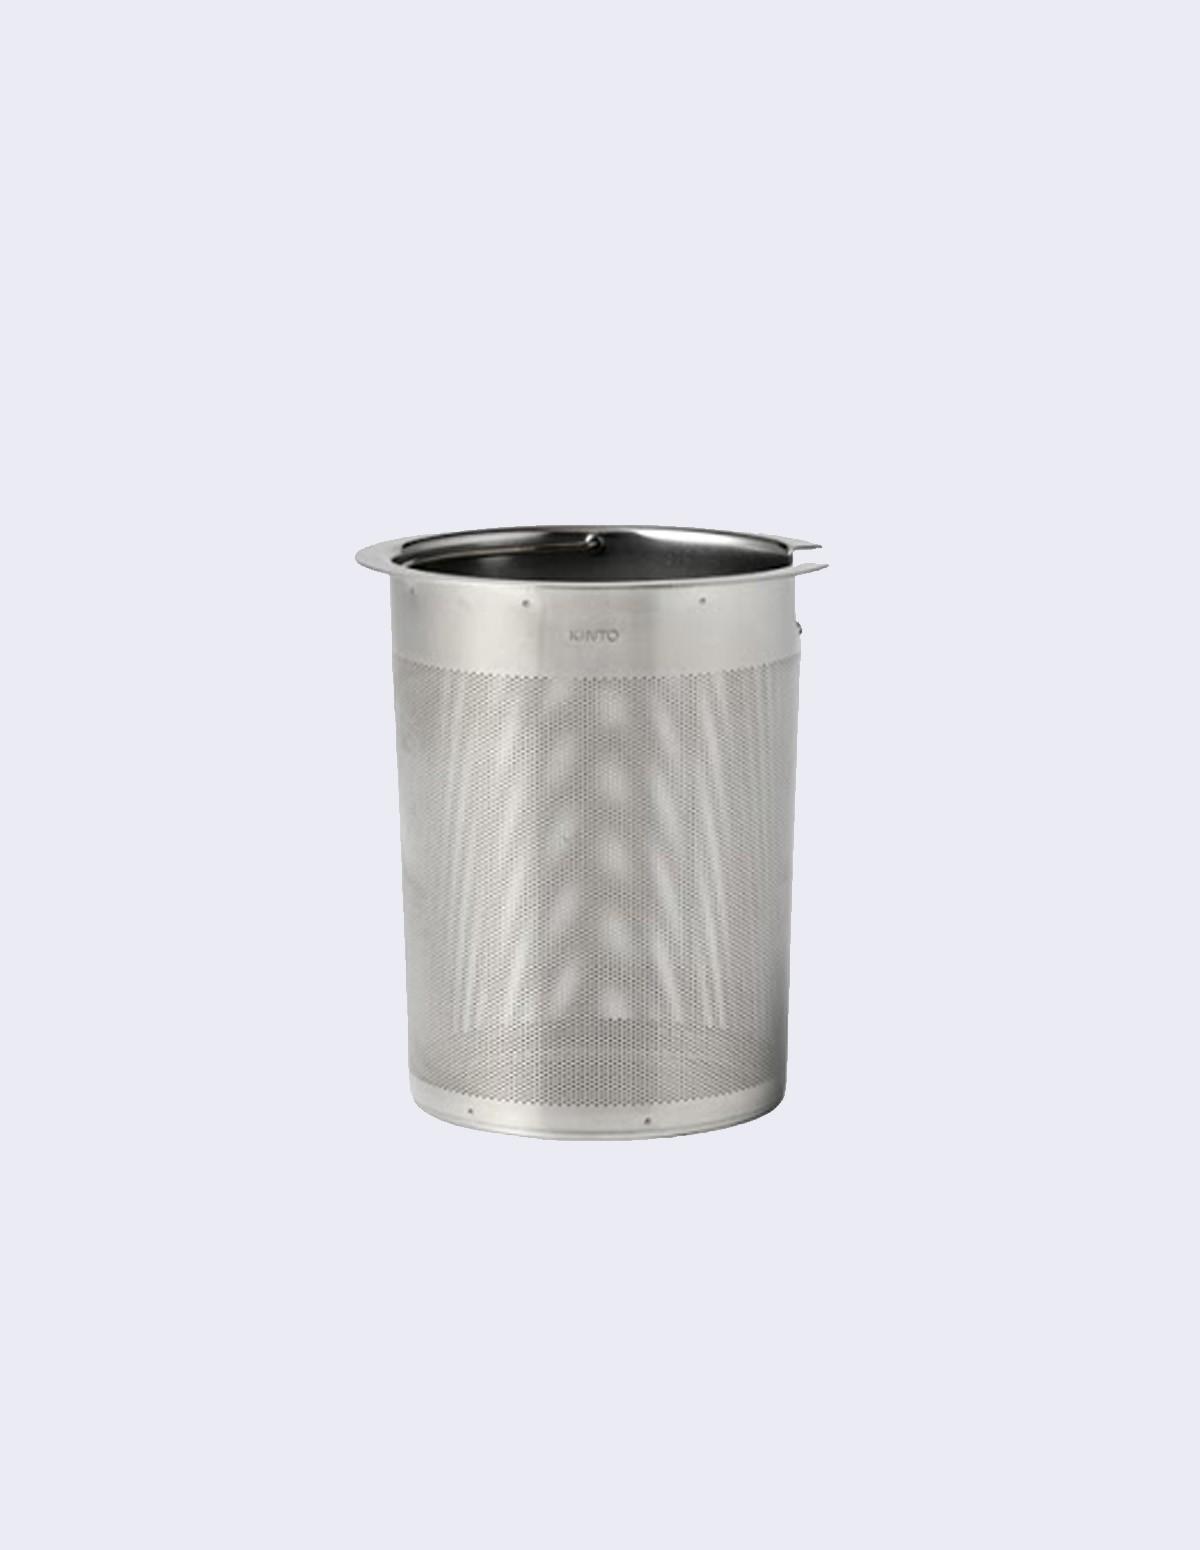 Clk 151 Teapot 500ml